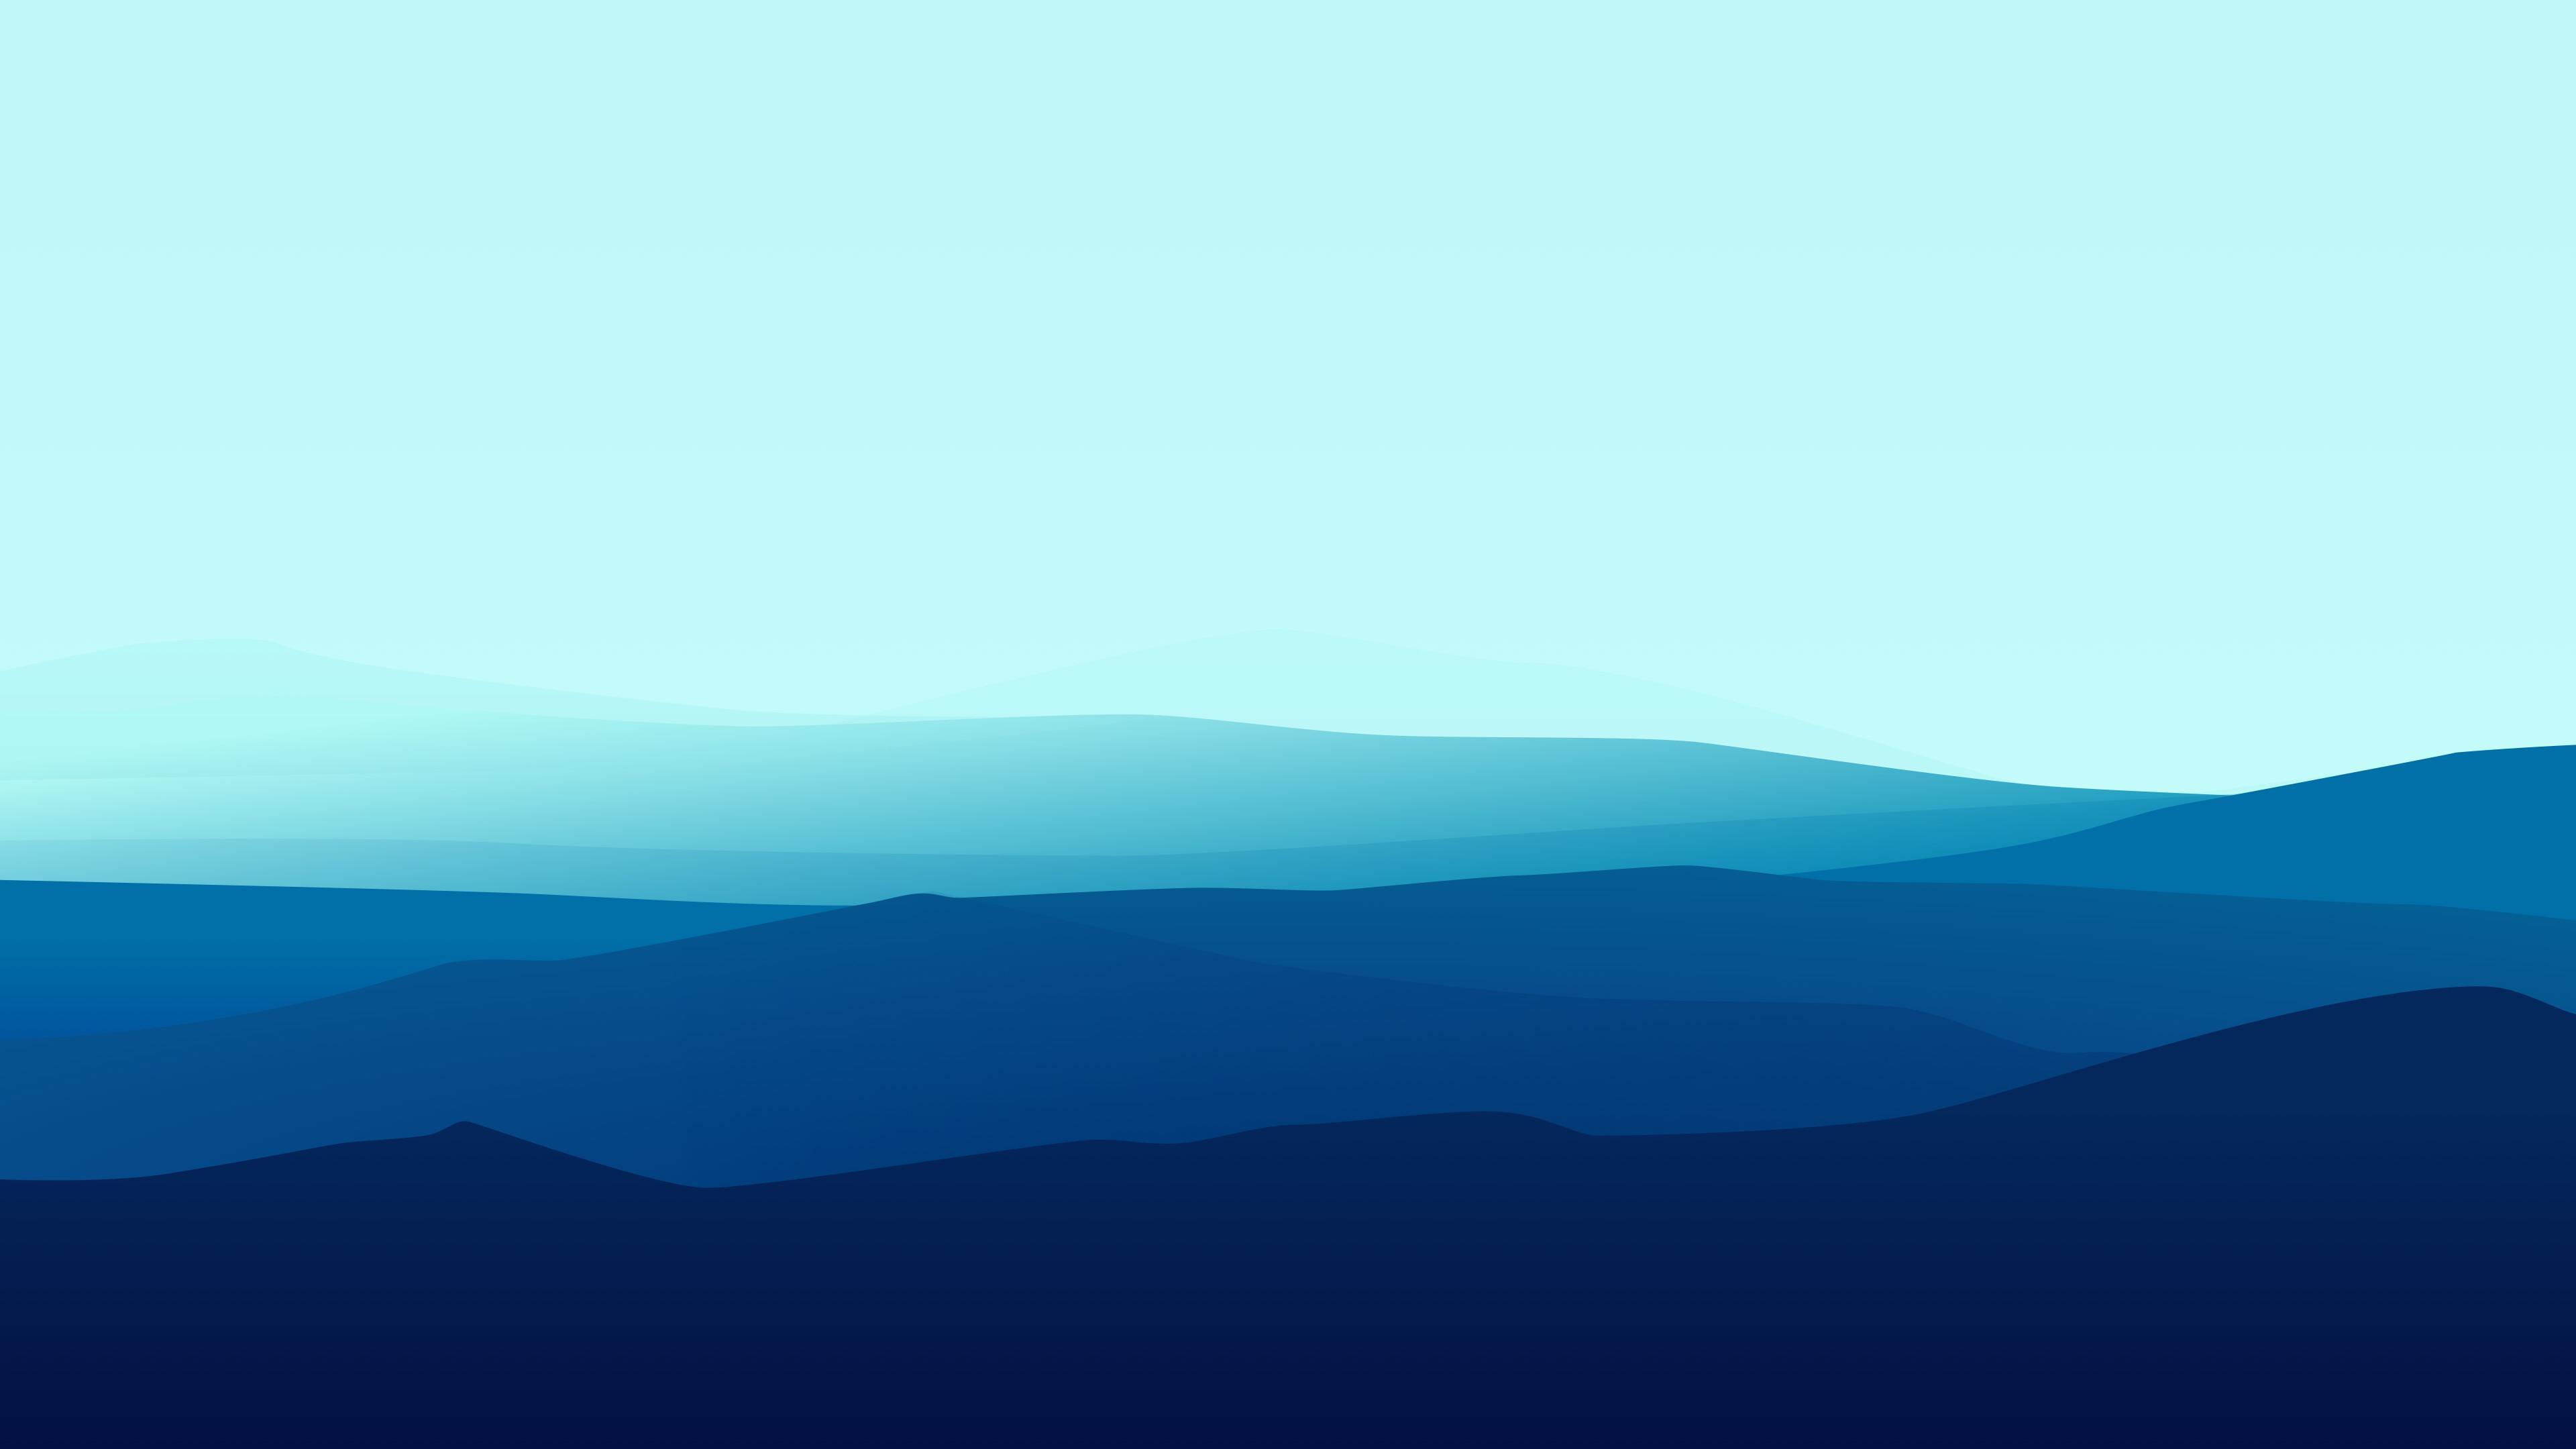 Blue Minimalist Wallpapers Wallpaper Cave